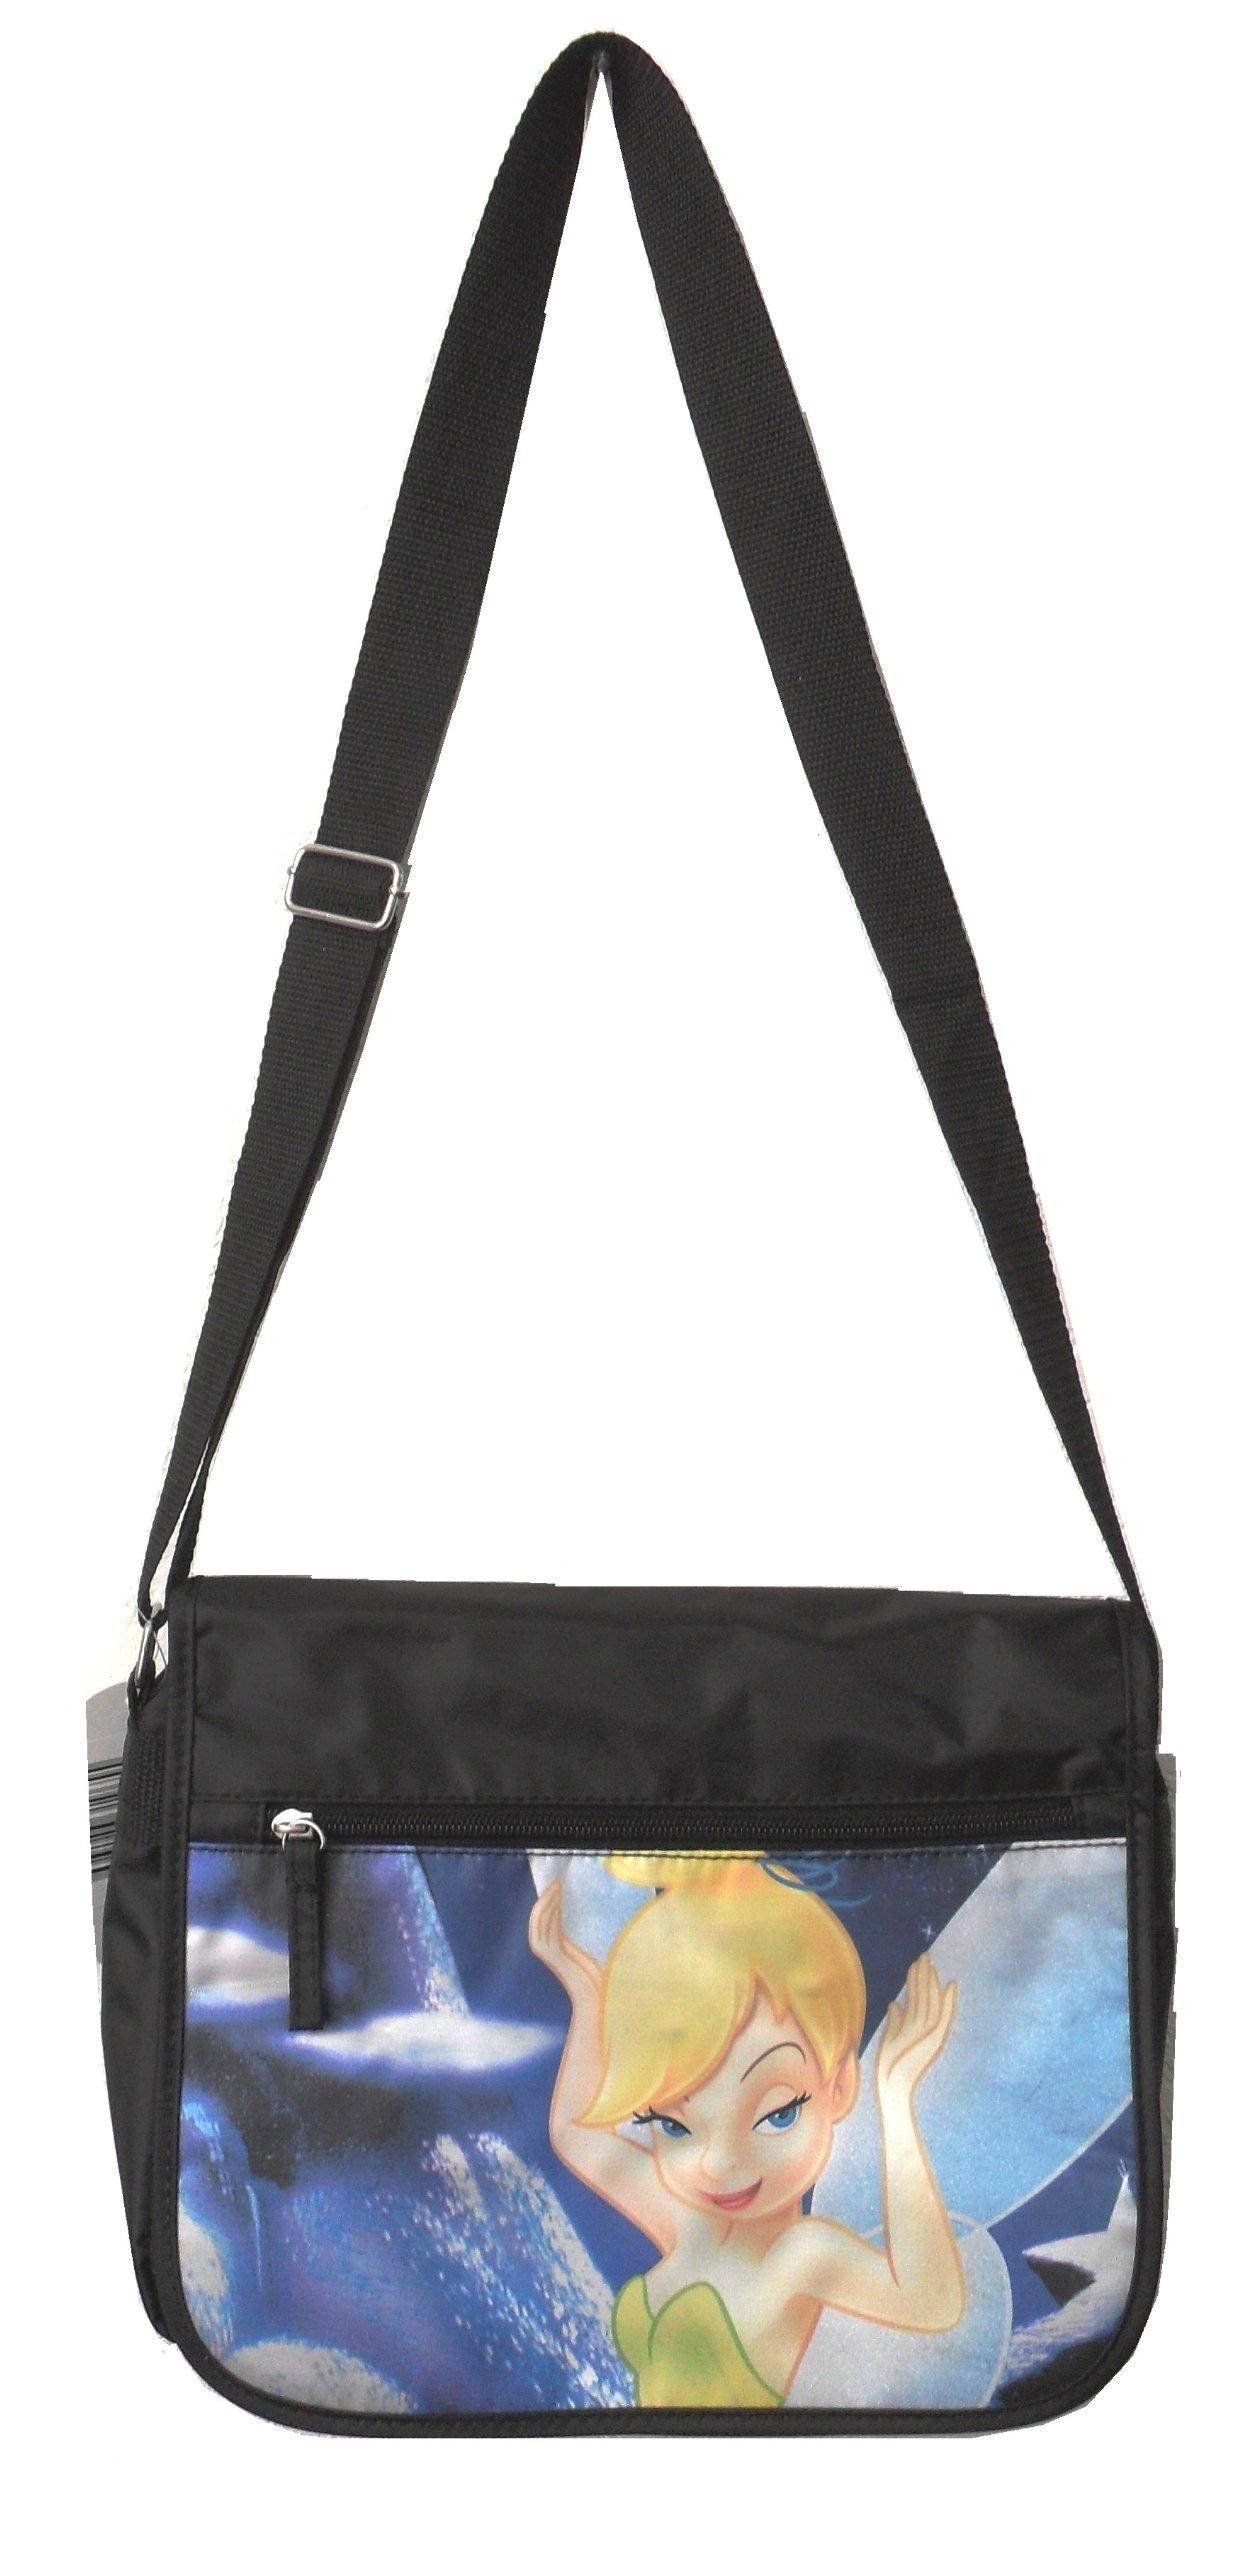 Disney Tinkerbell Small Messenger Bag- Messenger Bag Style Shouler Bag